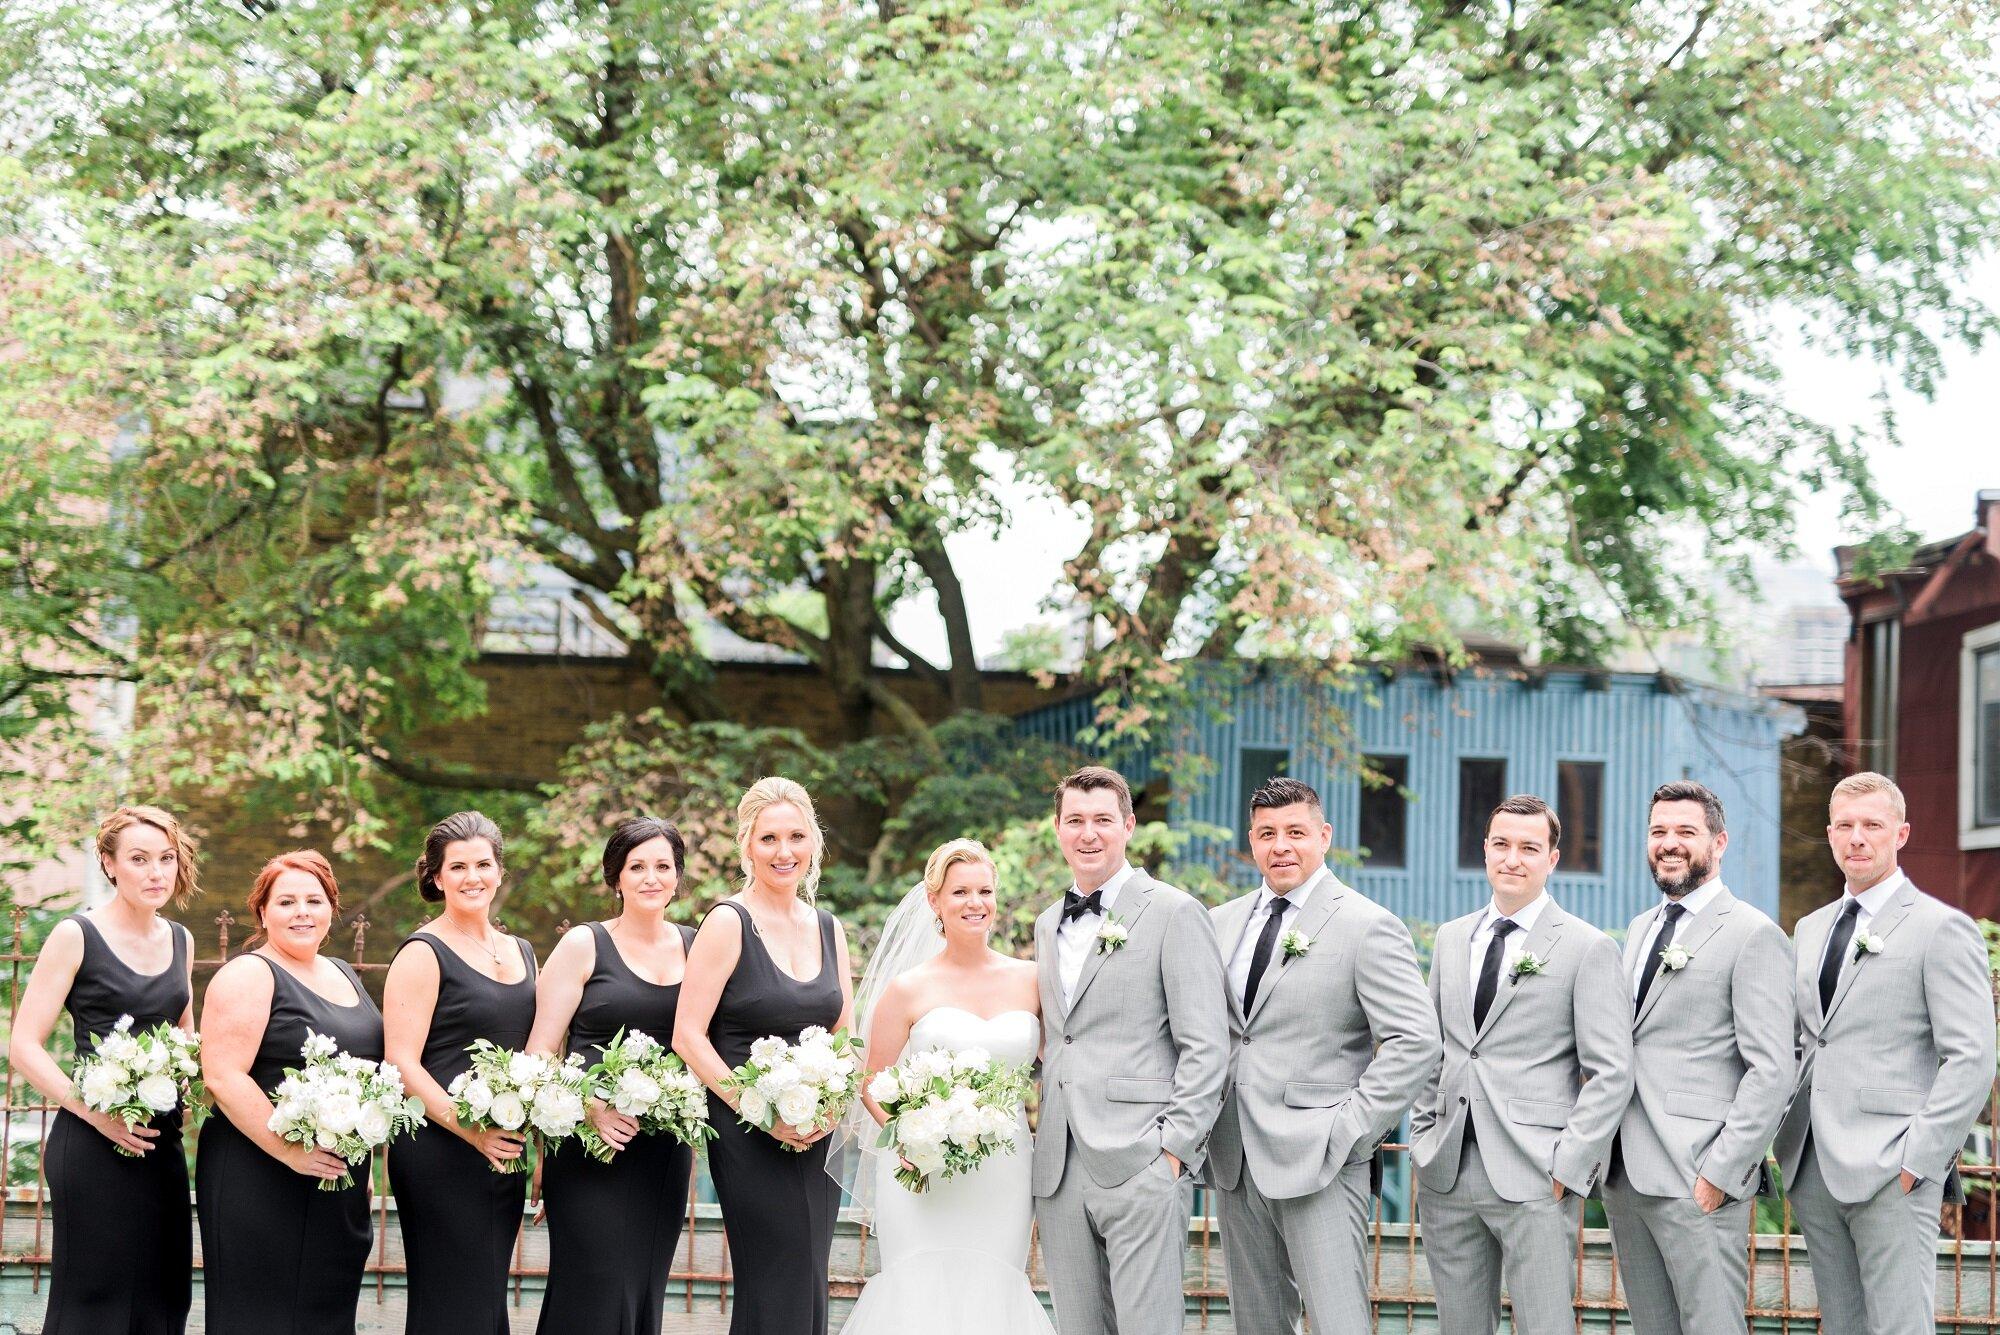 berkeley-field-house-wedding-kj-and-co-13.jpg